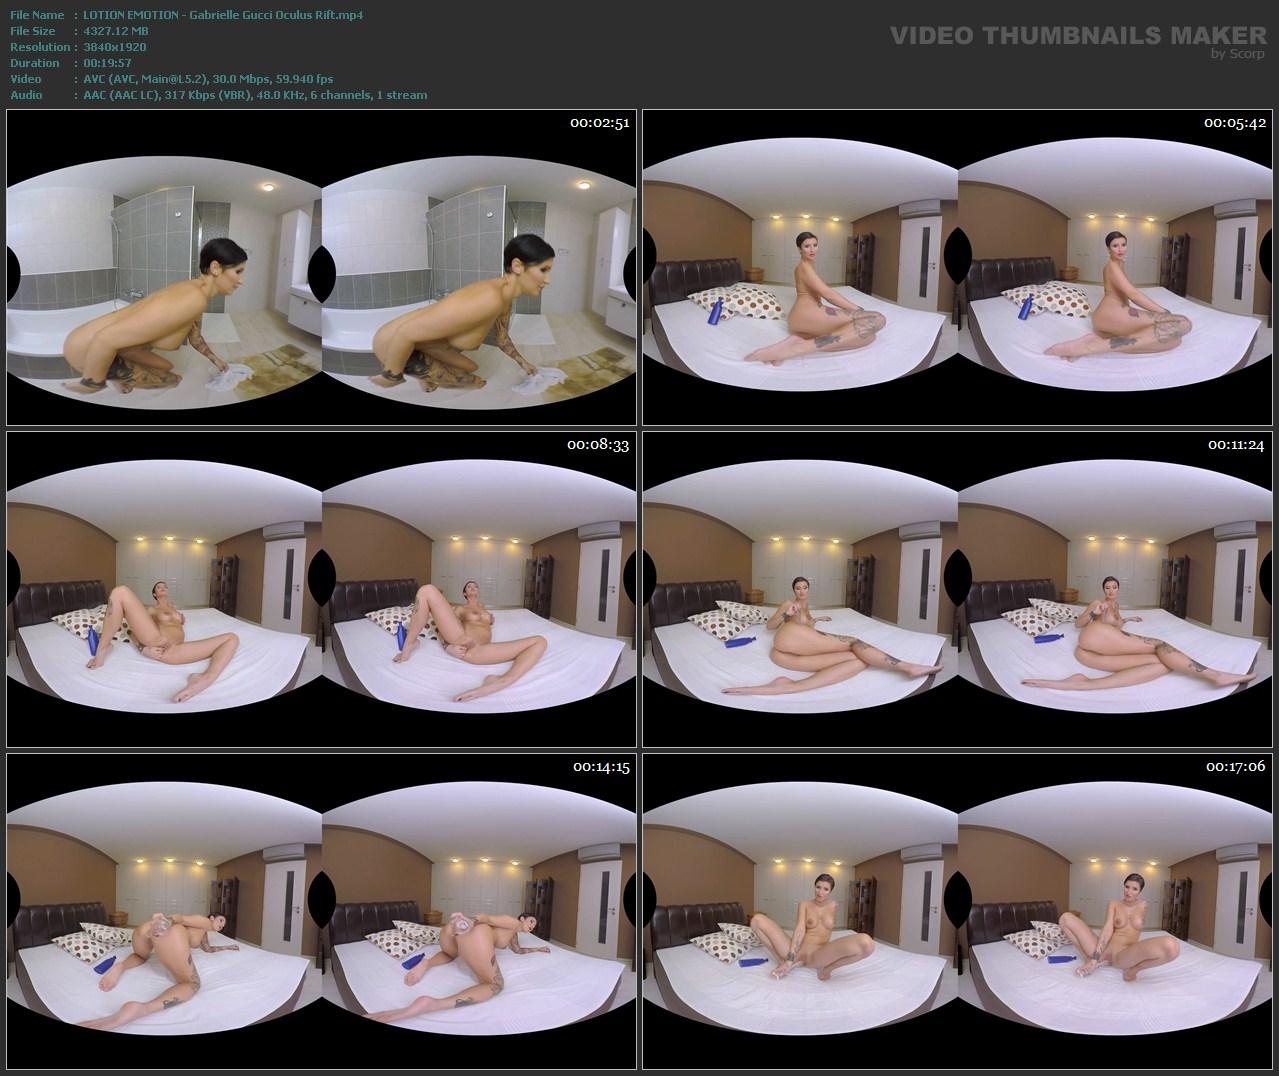 LOTION_EMOTION_-_Gabrielle_Gucci_Oculus_Rift_thumb.jpg